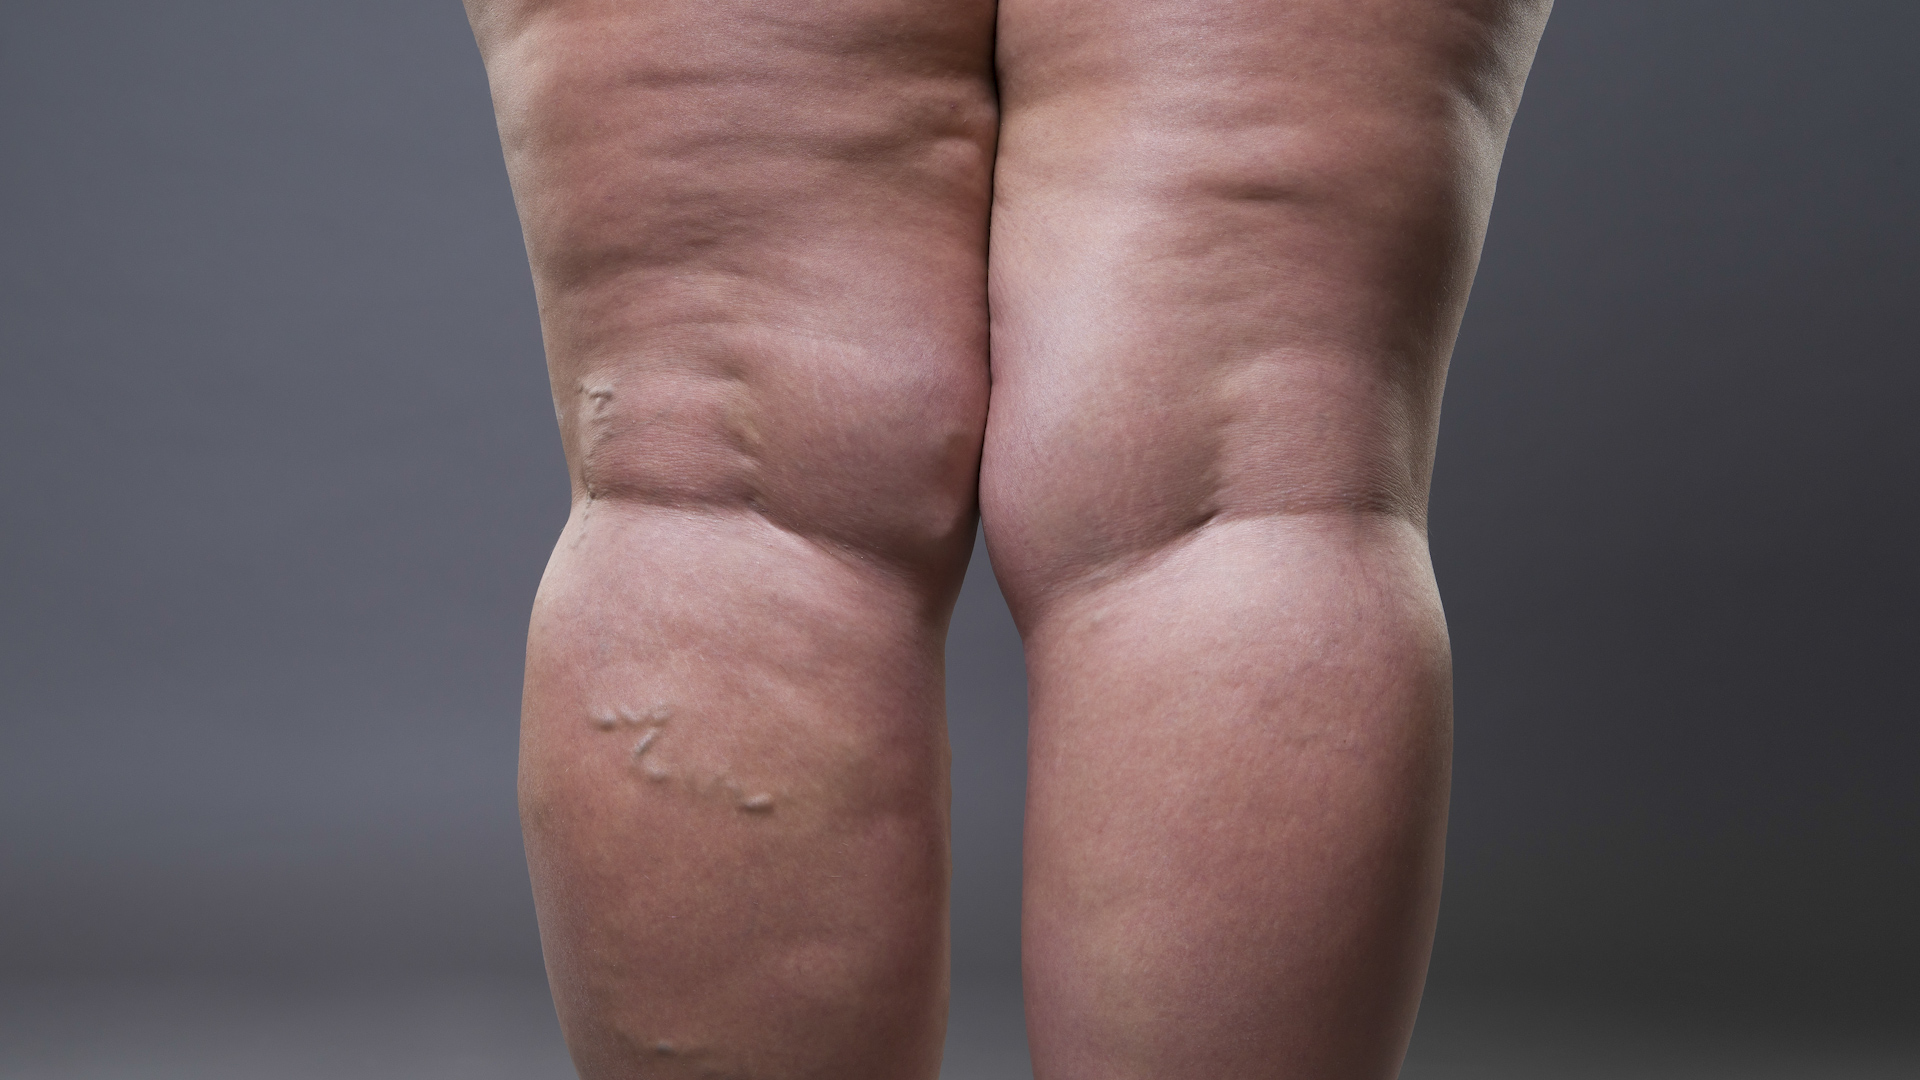 Grube nogi mogą być objawem choroby